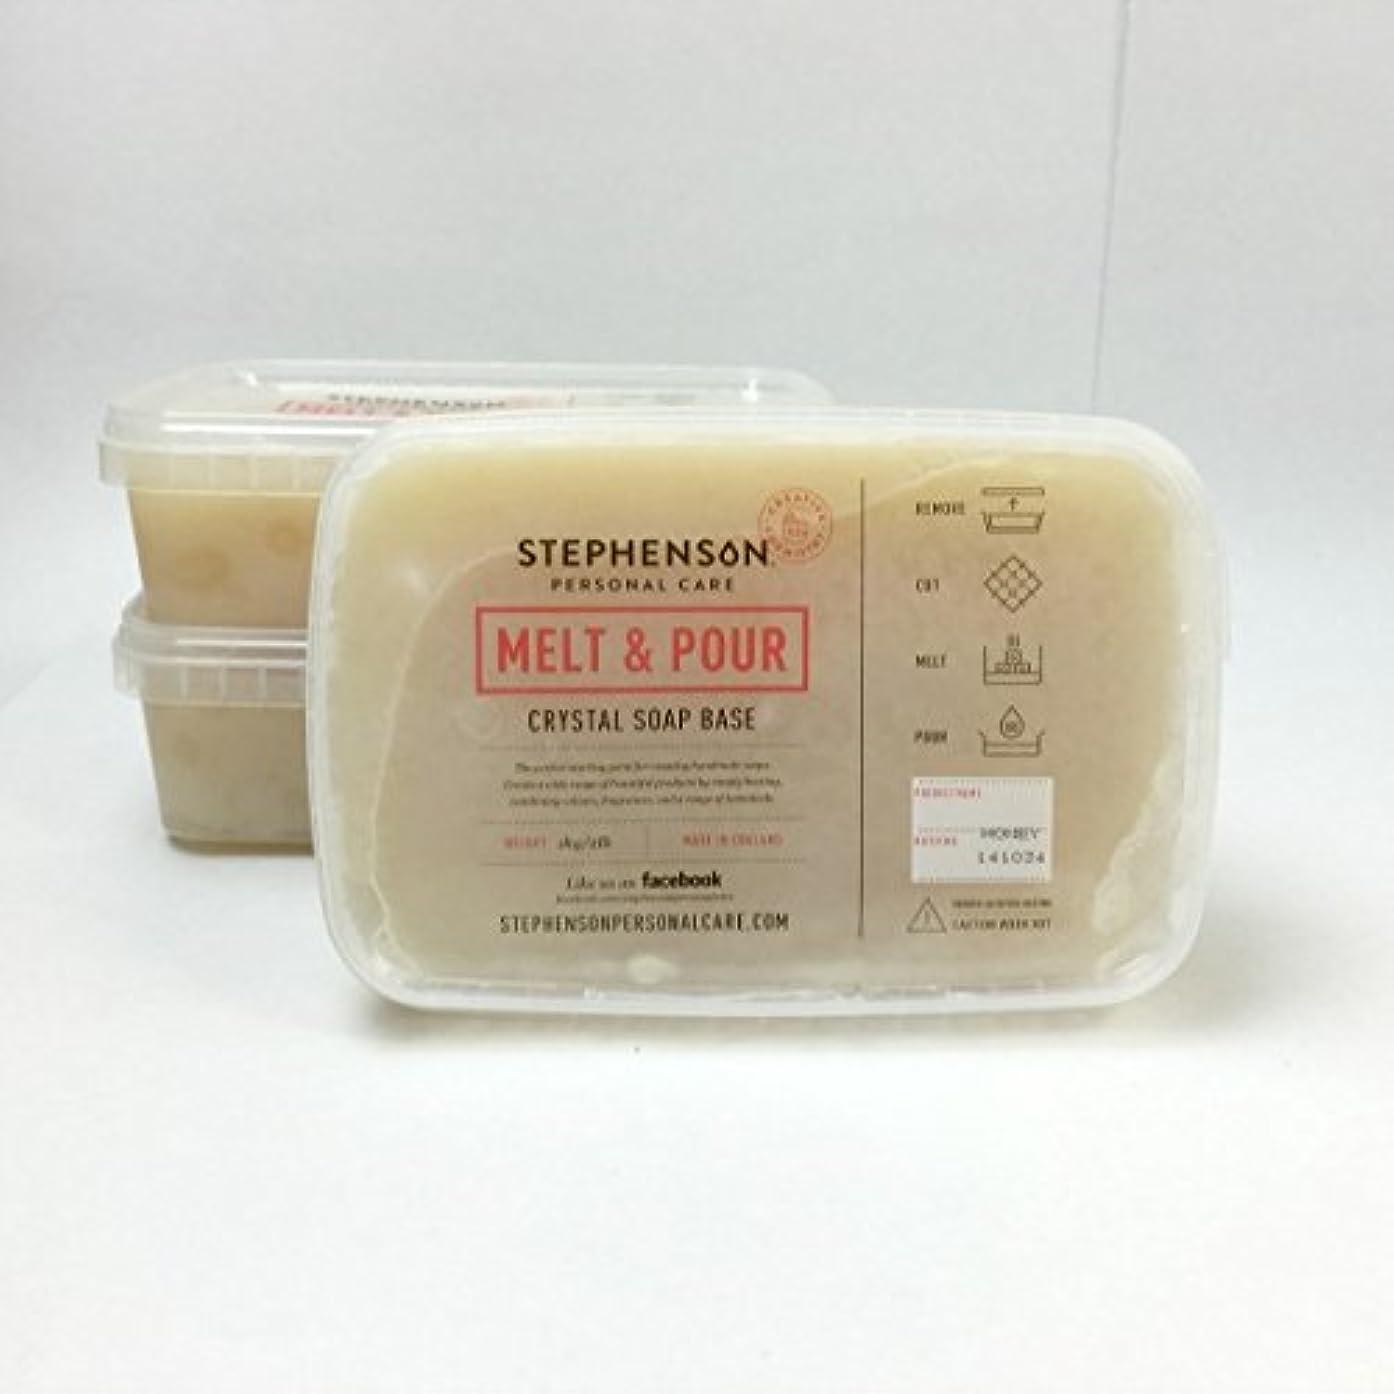 Stephenson Step-Honey Soap Base, Light Orange Color